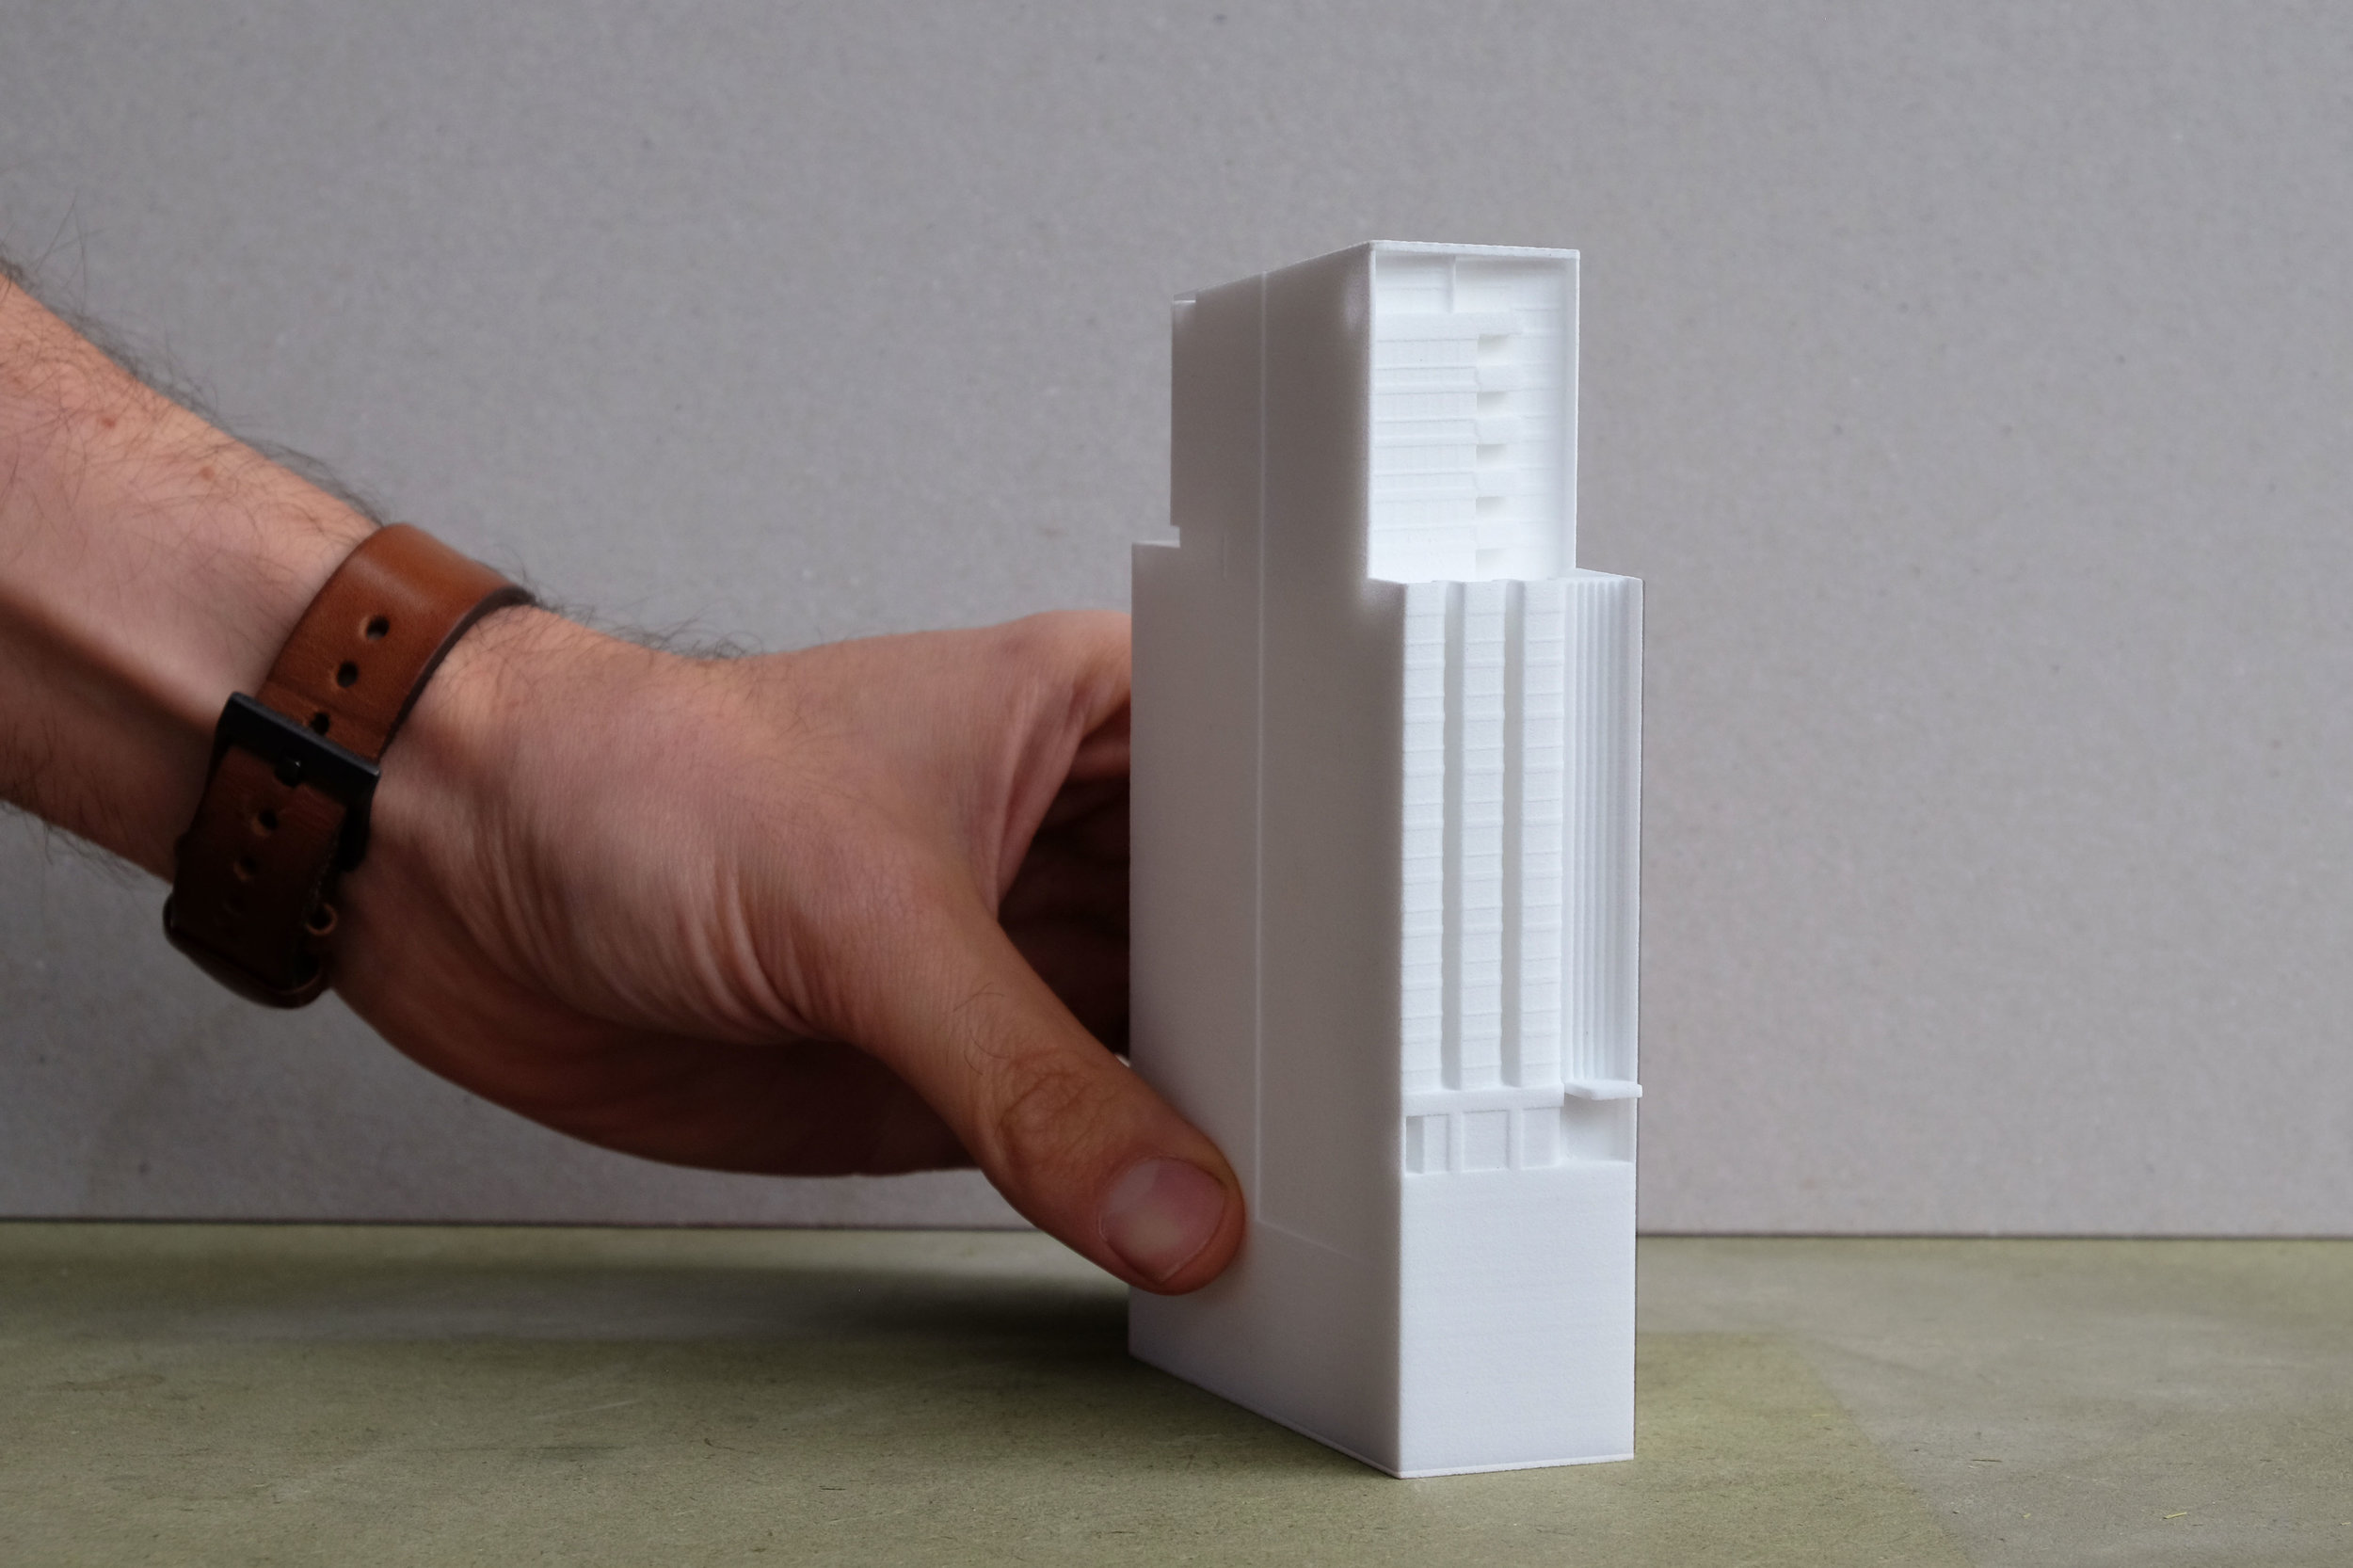 Make_models_City_of_Sydney_3D_print_scale_architecture2.jpg